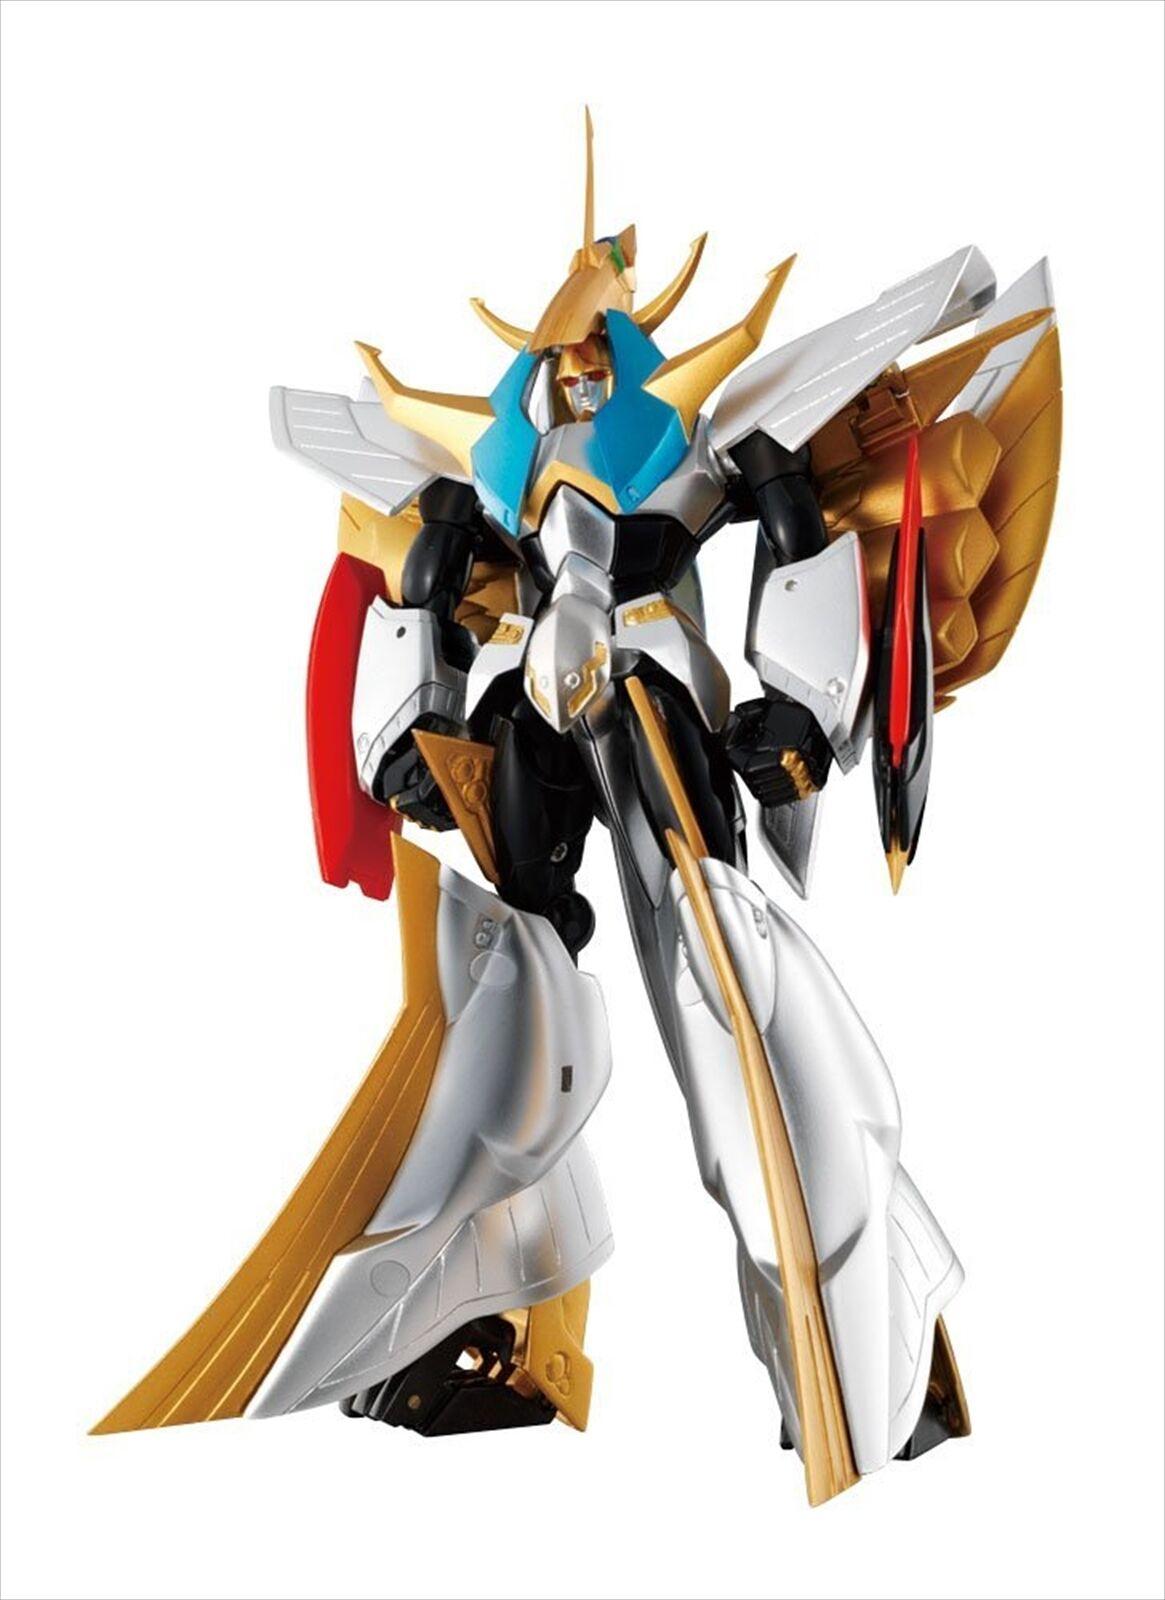 Bandai Super Robot Chogokin God Raideen Action Figure